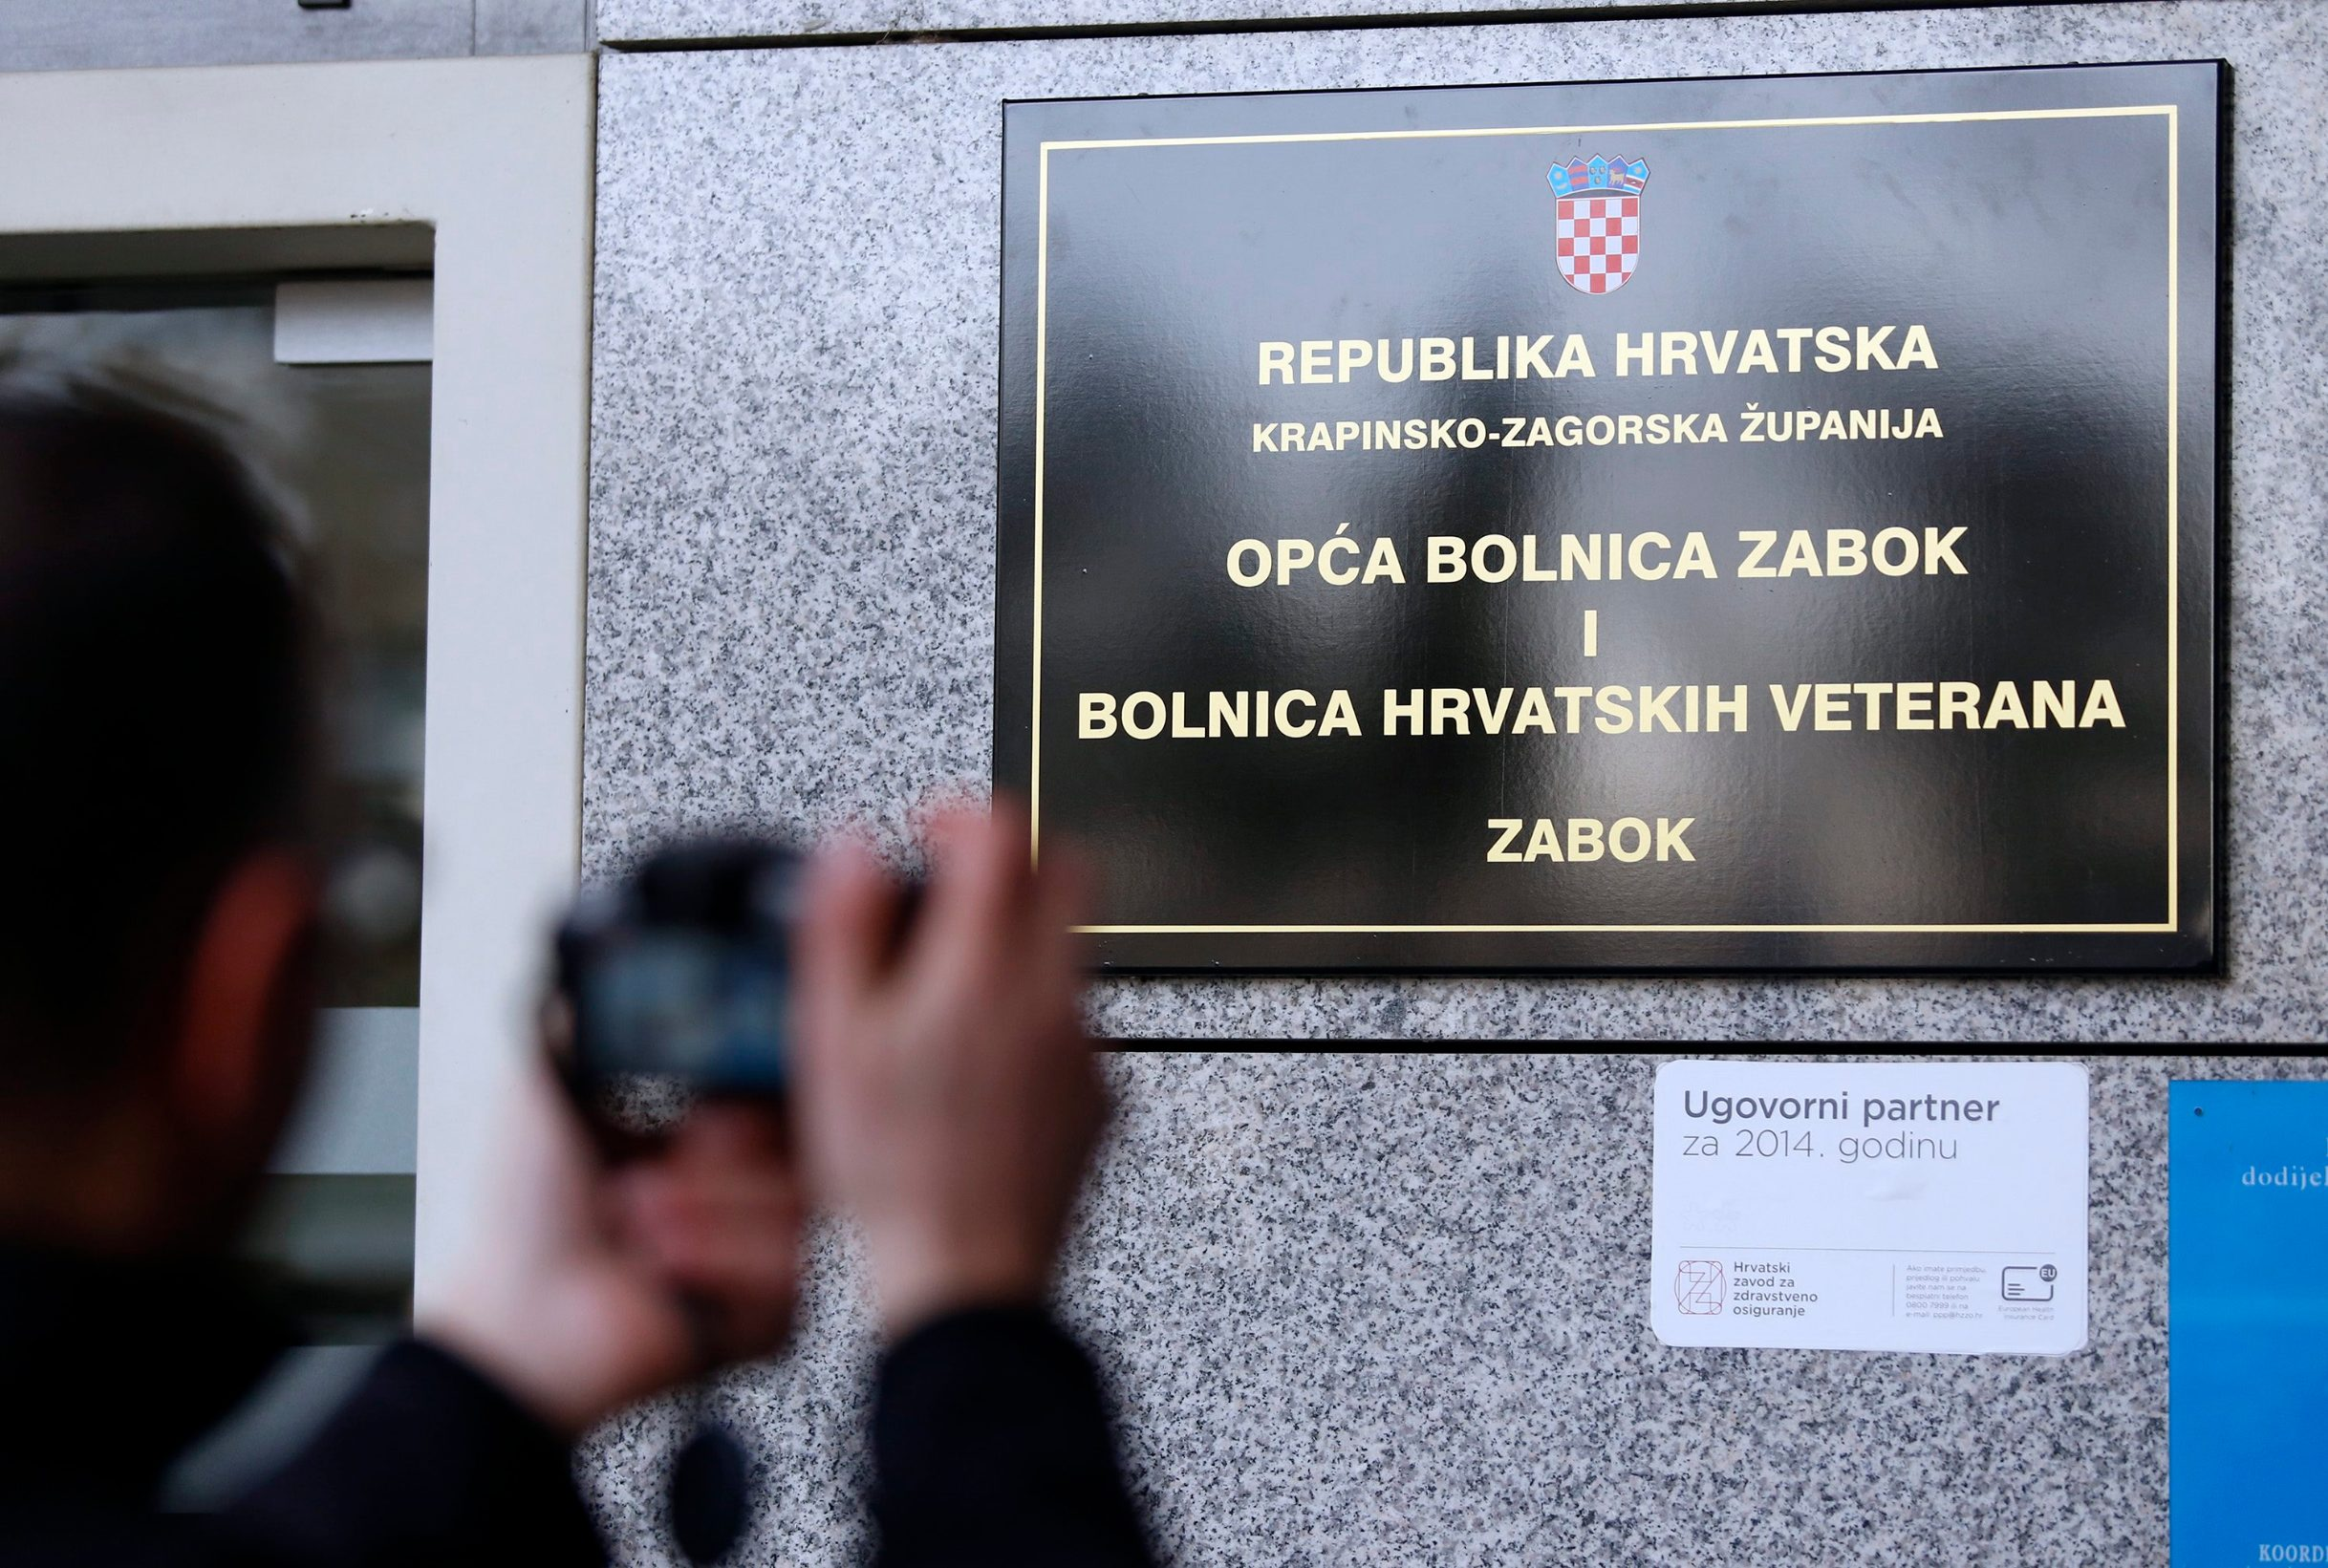 Opća bolnica Zabok i bolnica hrvatskih veterana